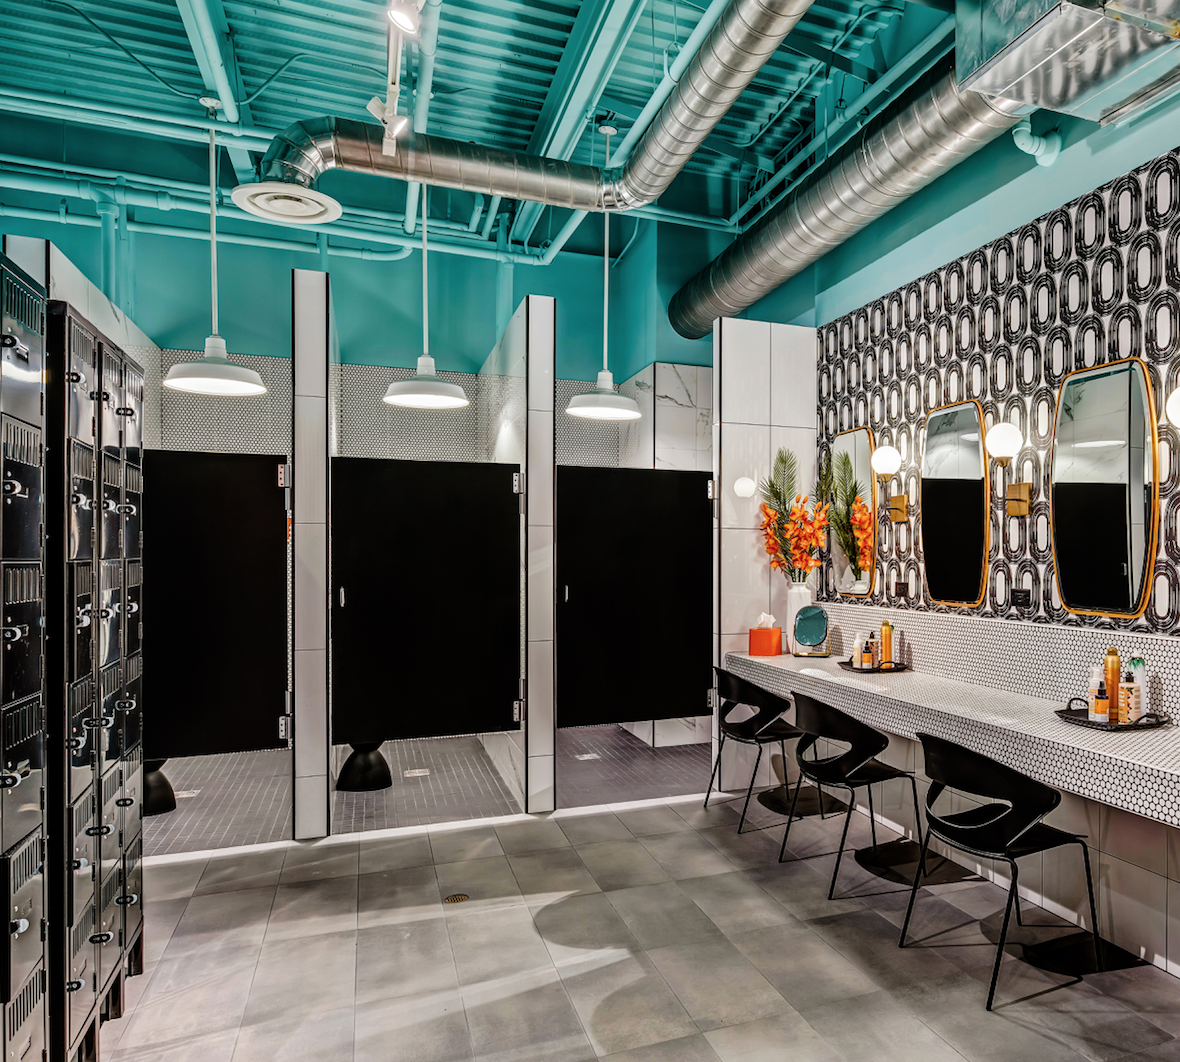 Yoga Studio Design Locker Room.png